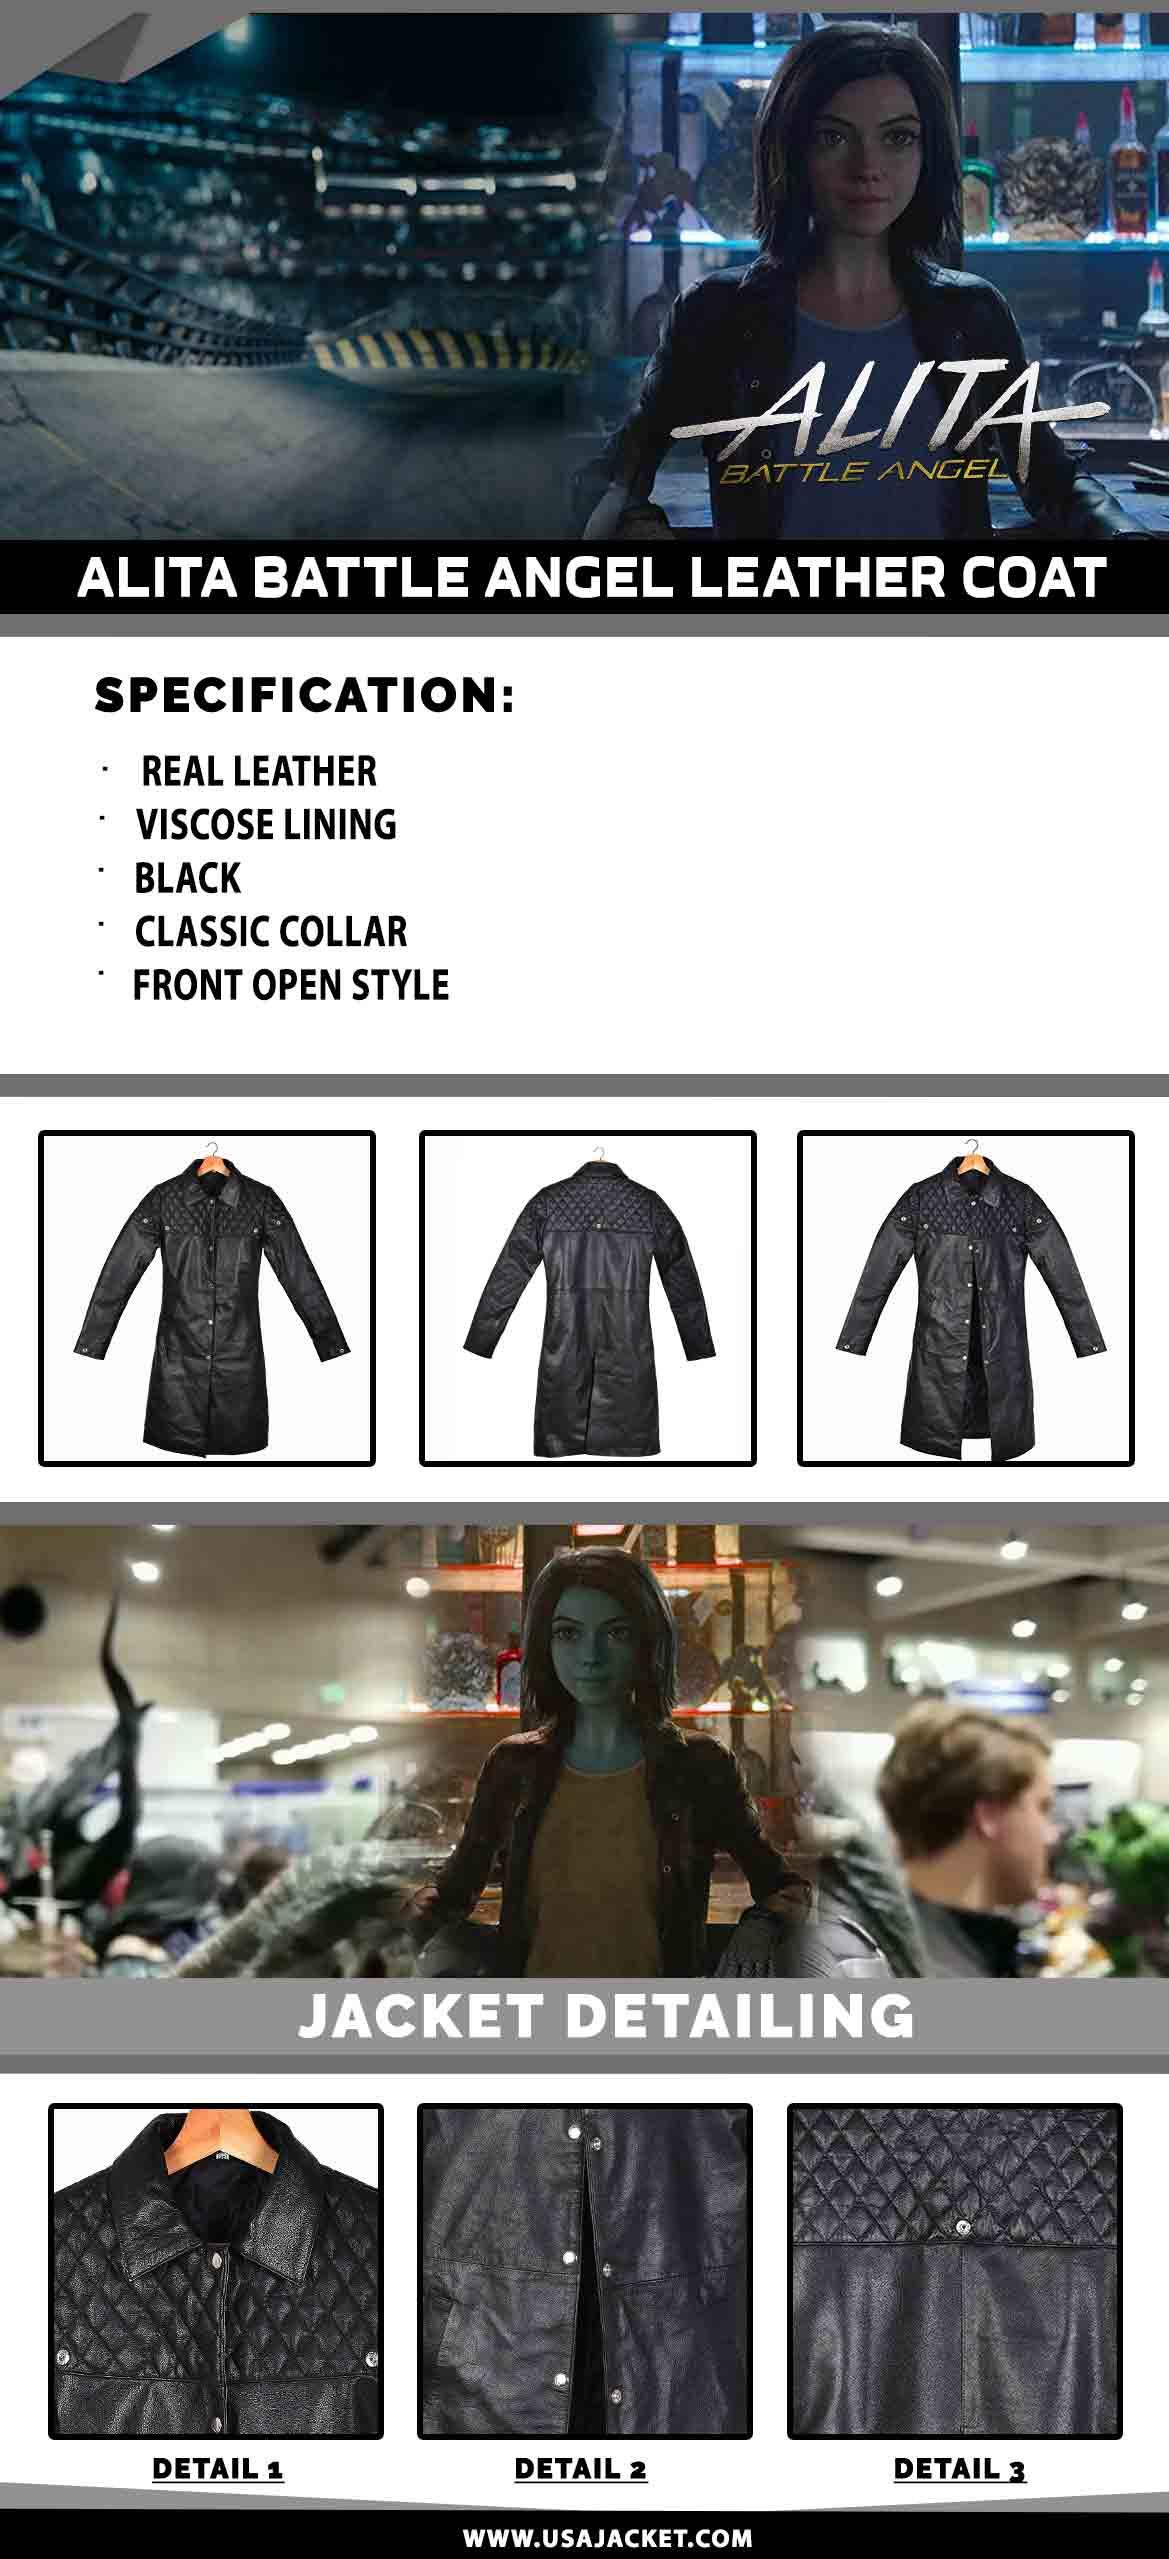 Alita Battle Angel Leather Coat Infographic